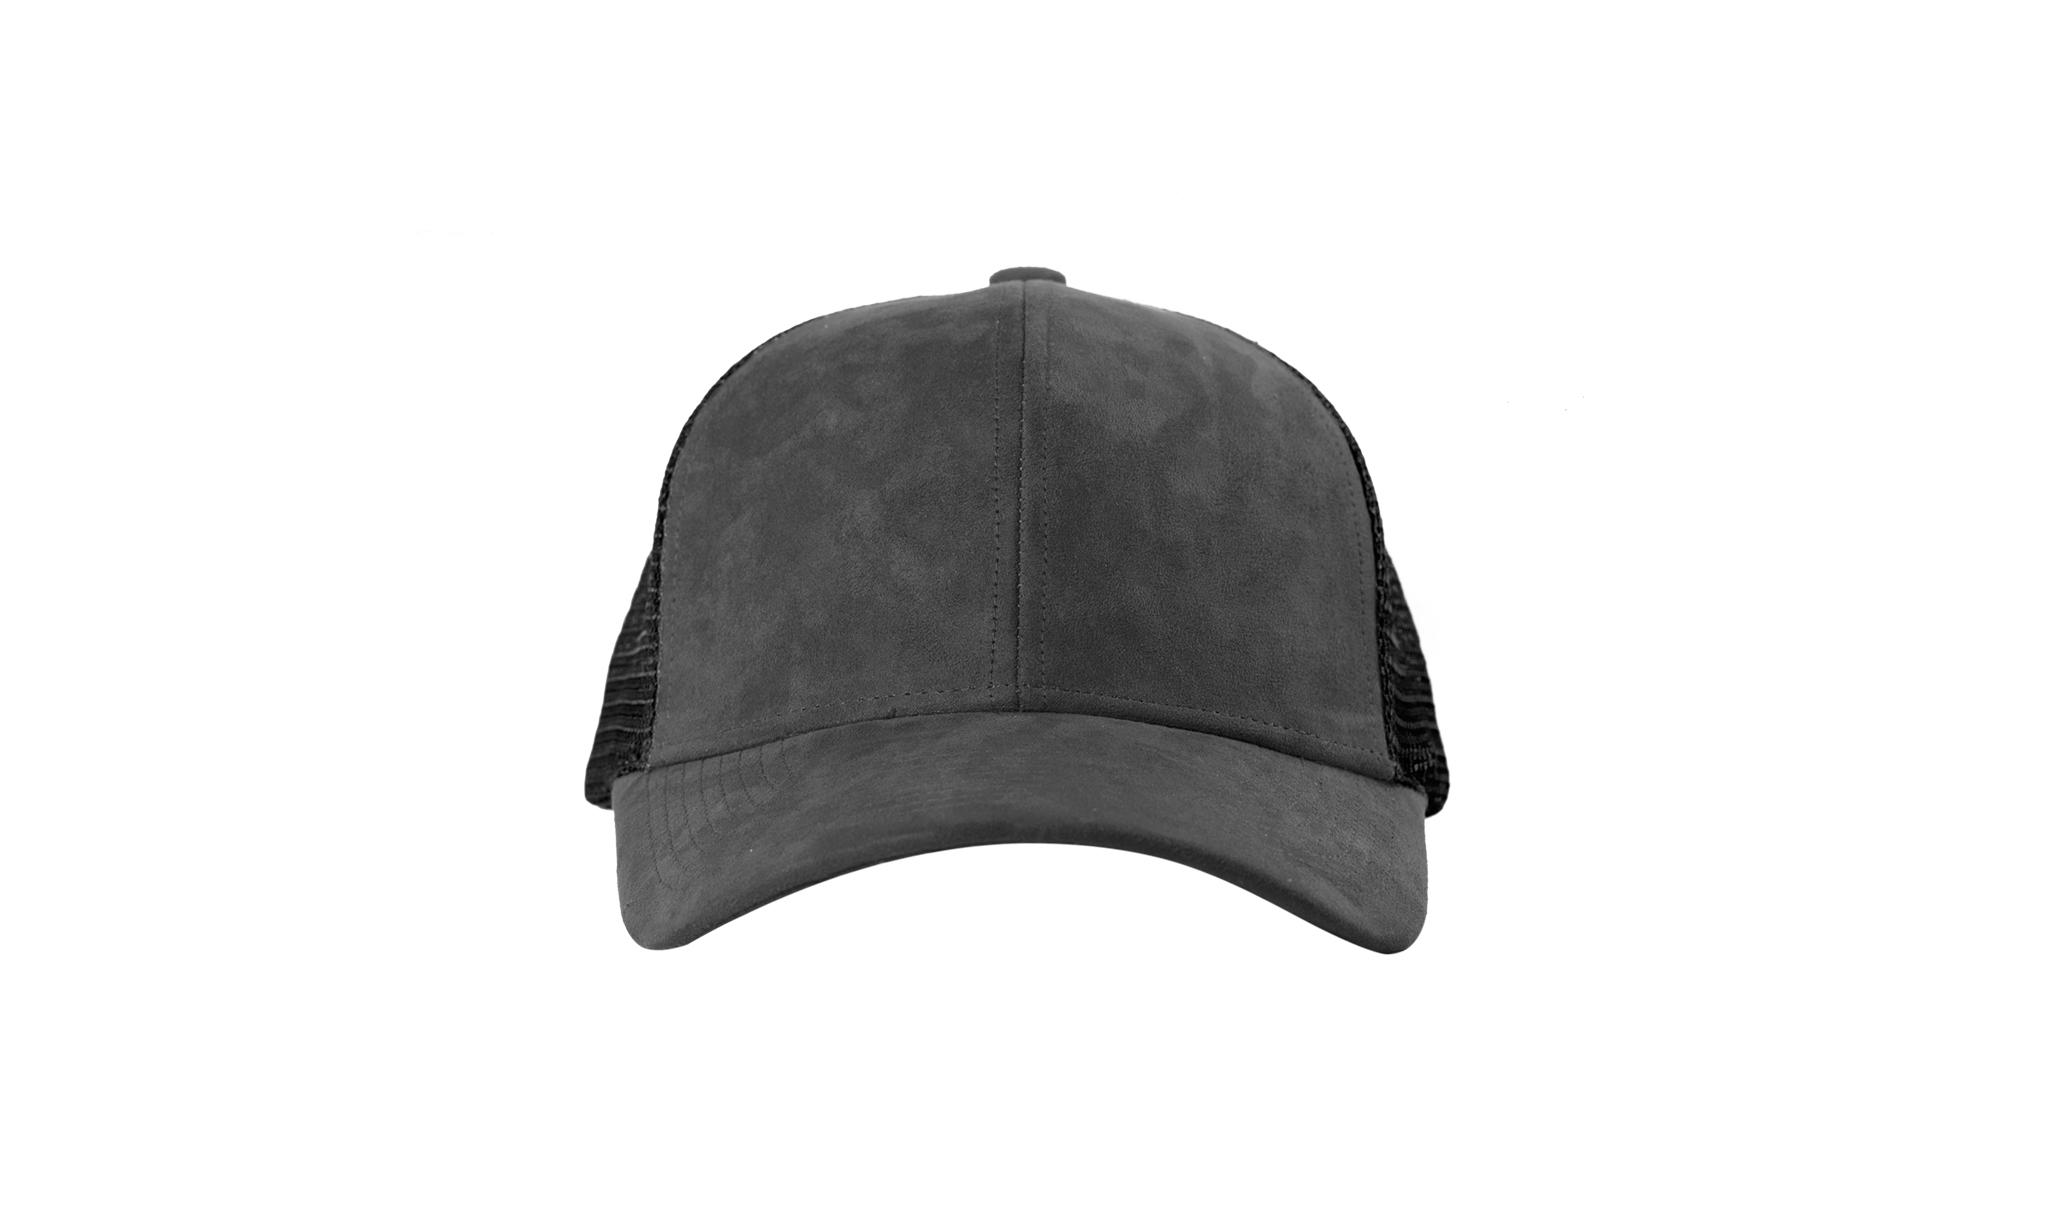 TRUCKER CAP ANTHRACITE SUEDE FRONT